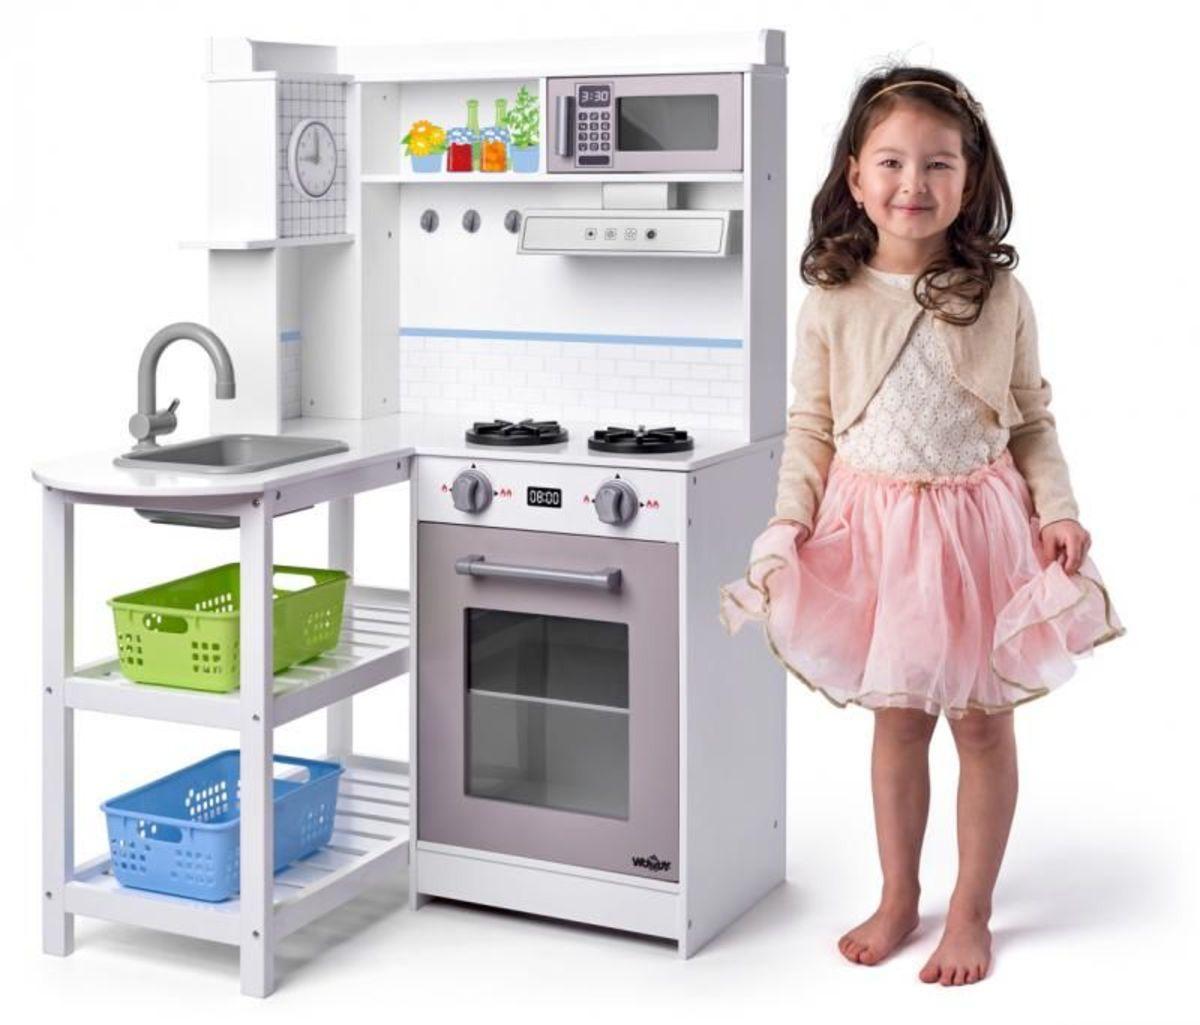 Interaktívny kuchynka Kelly s príslušenstvom Interactive kitchen